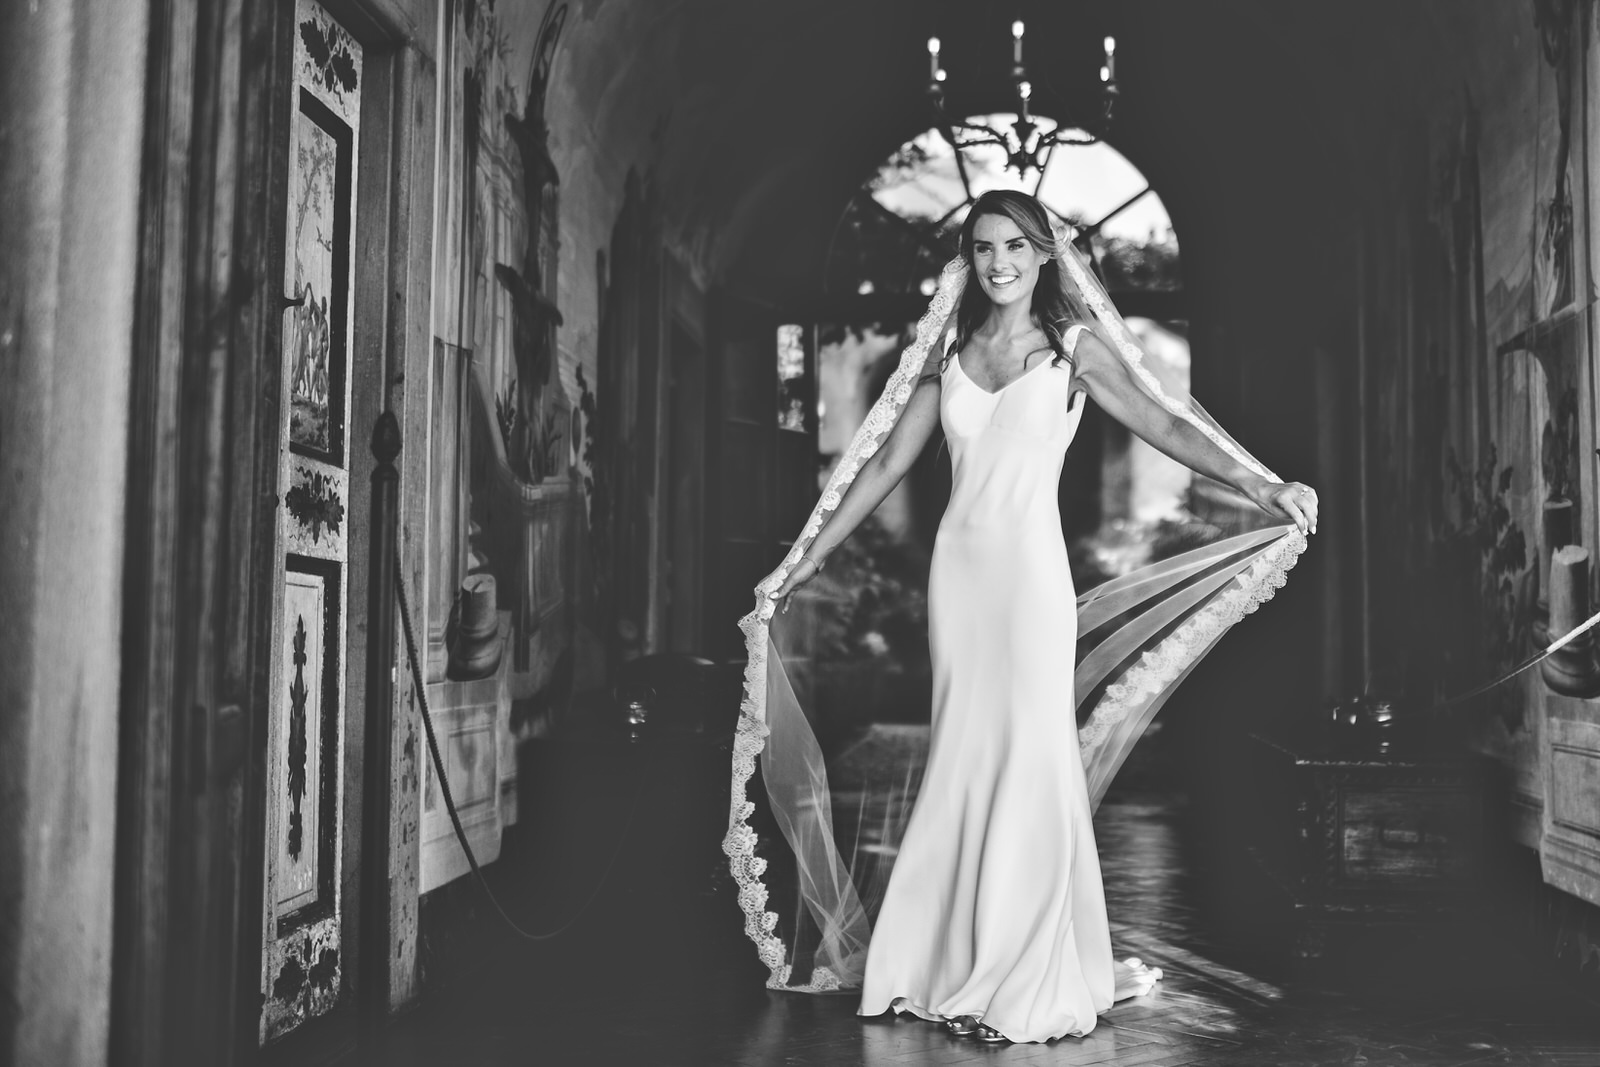 wedding photographer in italy-venice-tuscany-florence-amalfi coast-como lake-villa del balbianello-siena-amalfi-ravello-belmond-villa cimbrone50